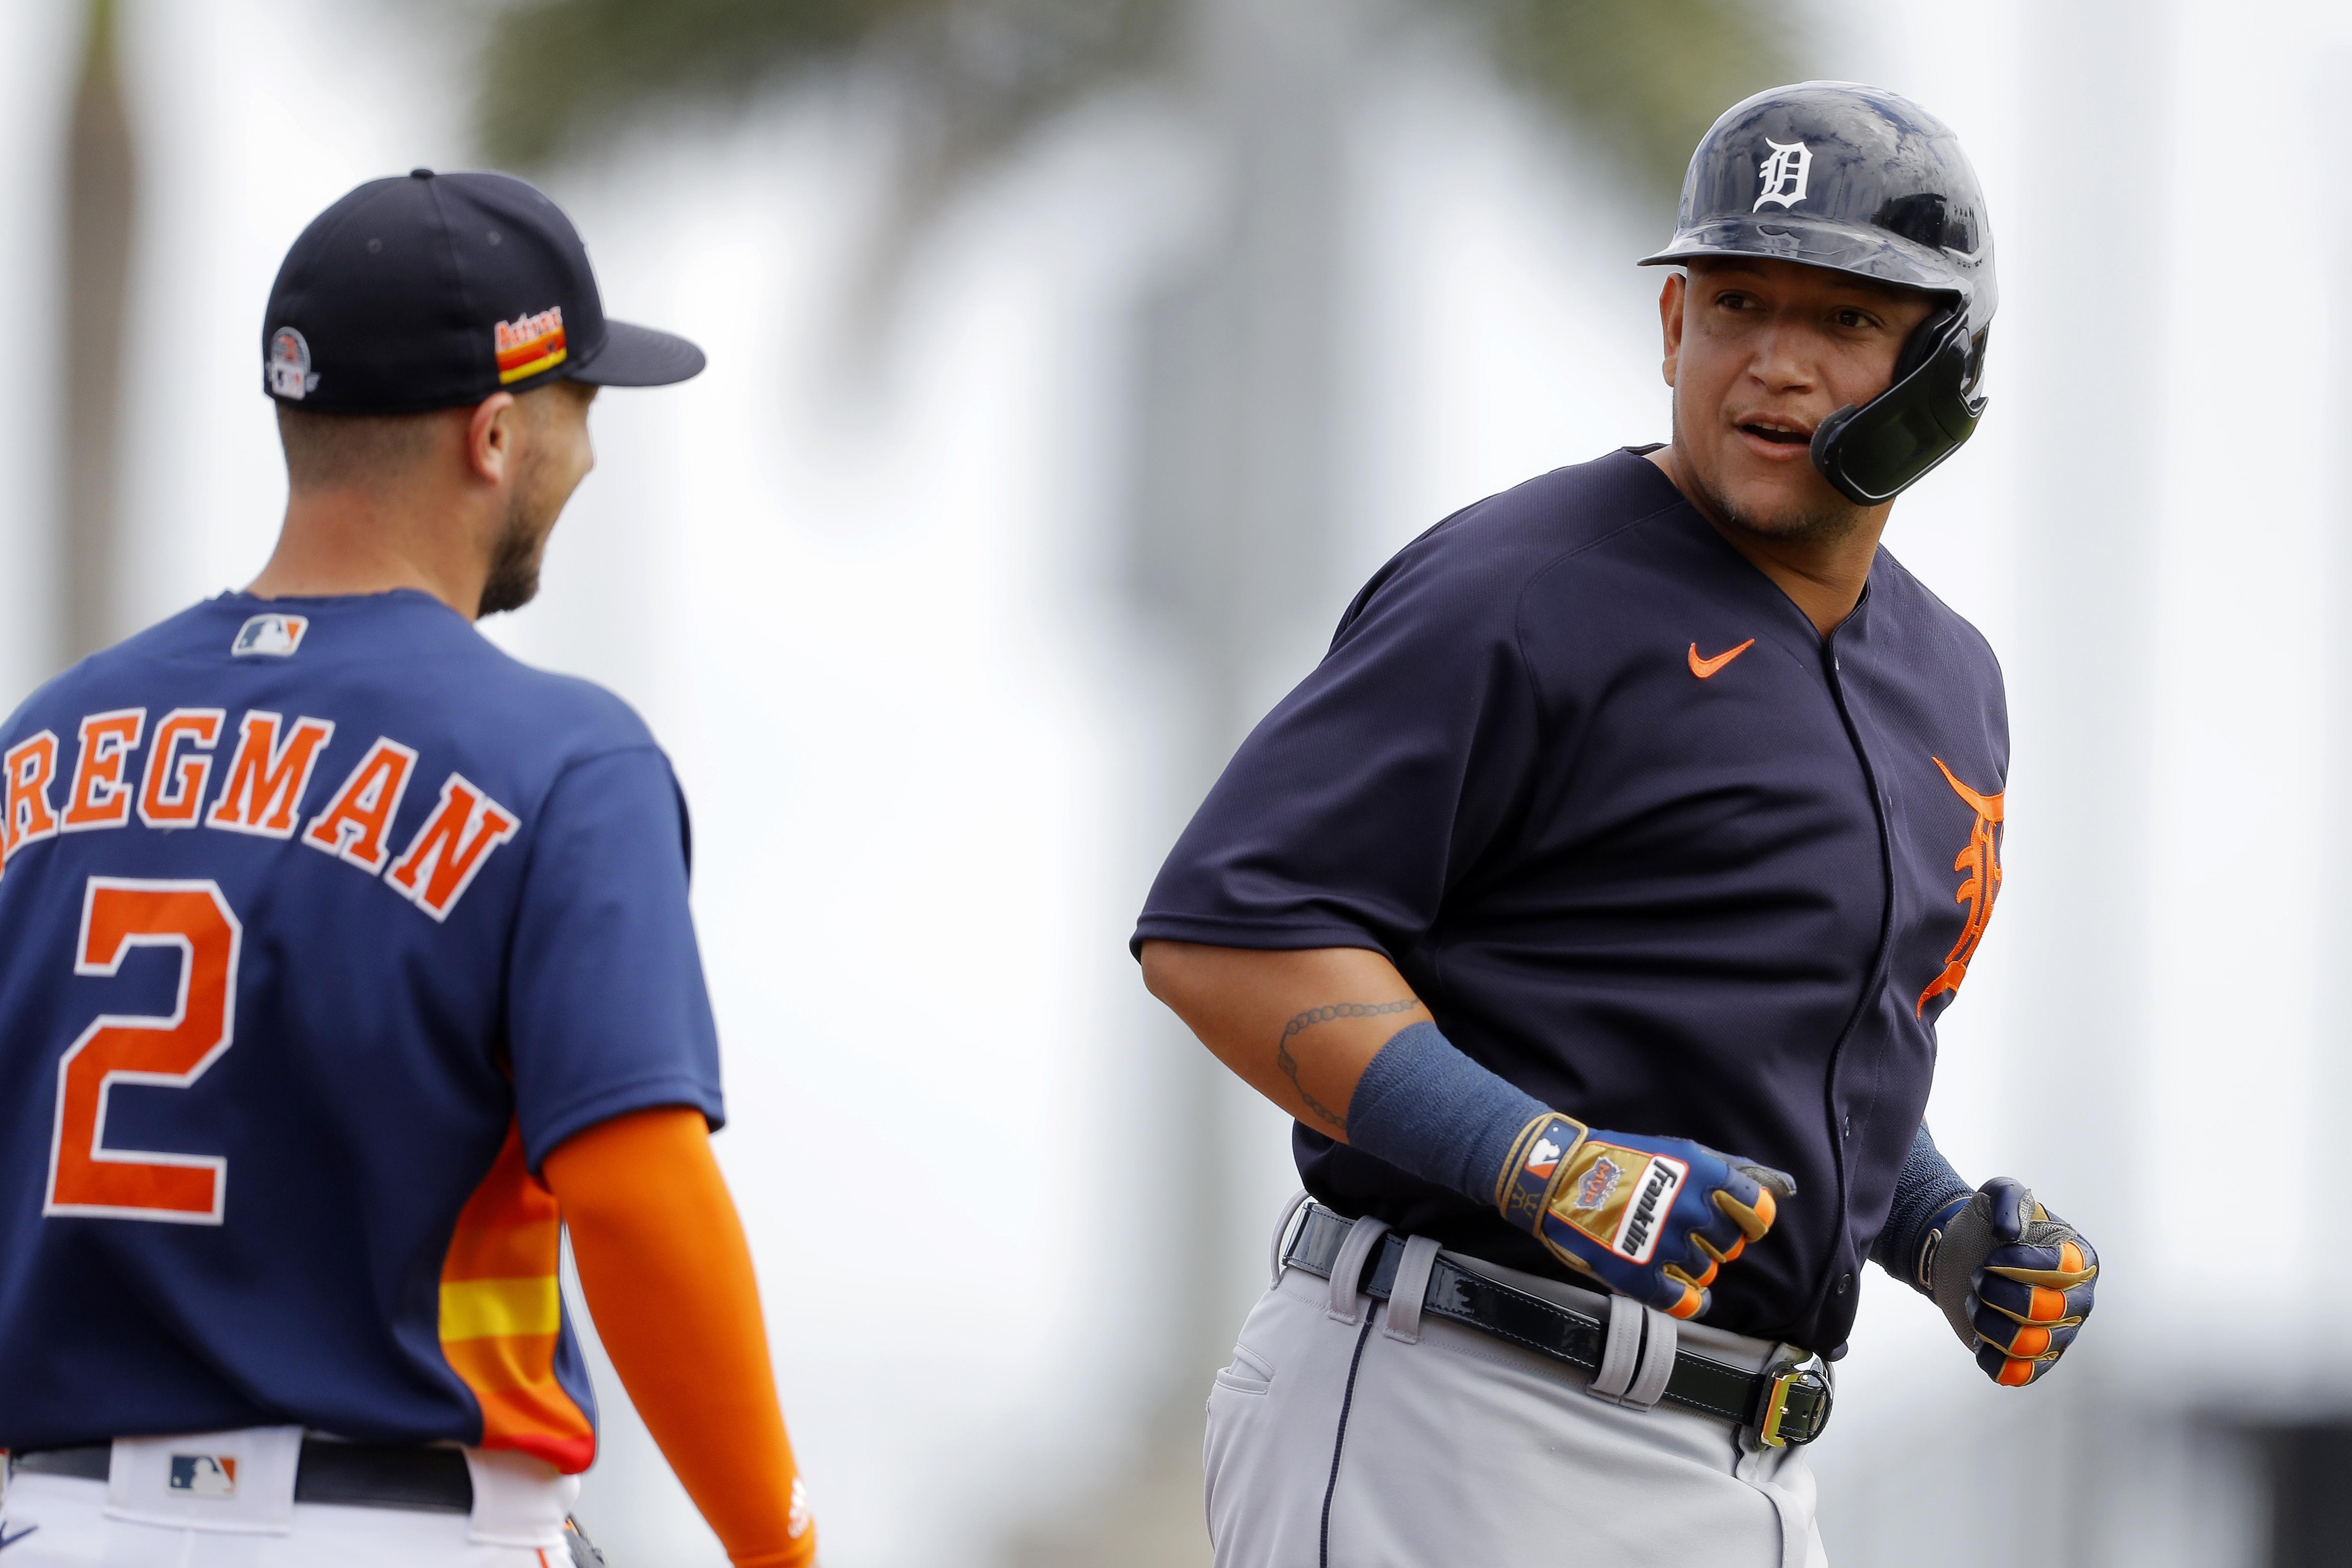 Miguel Cabrera Detroit Tigers Spring Training Baseball Player Jersey